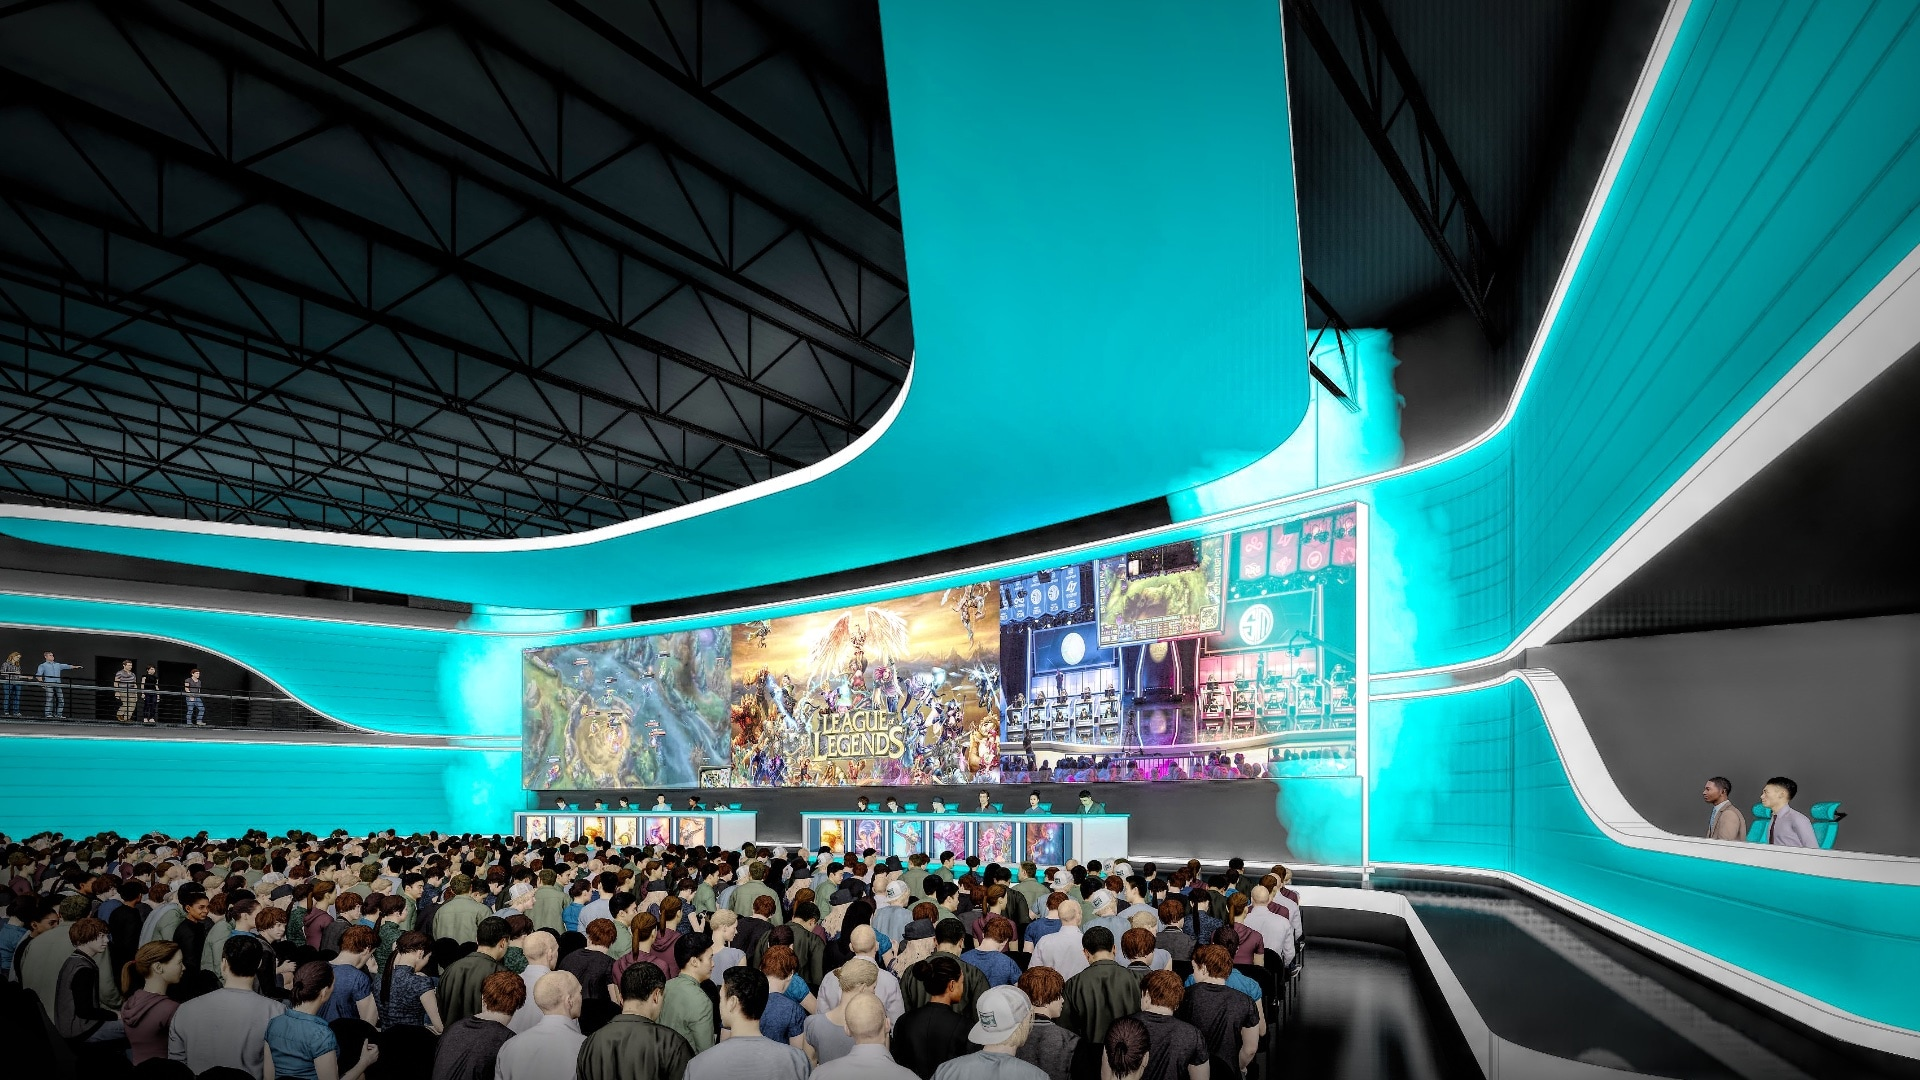 Cedar Point eSports arena